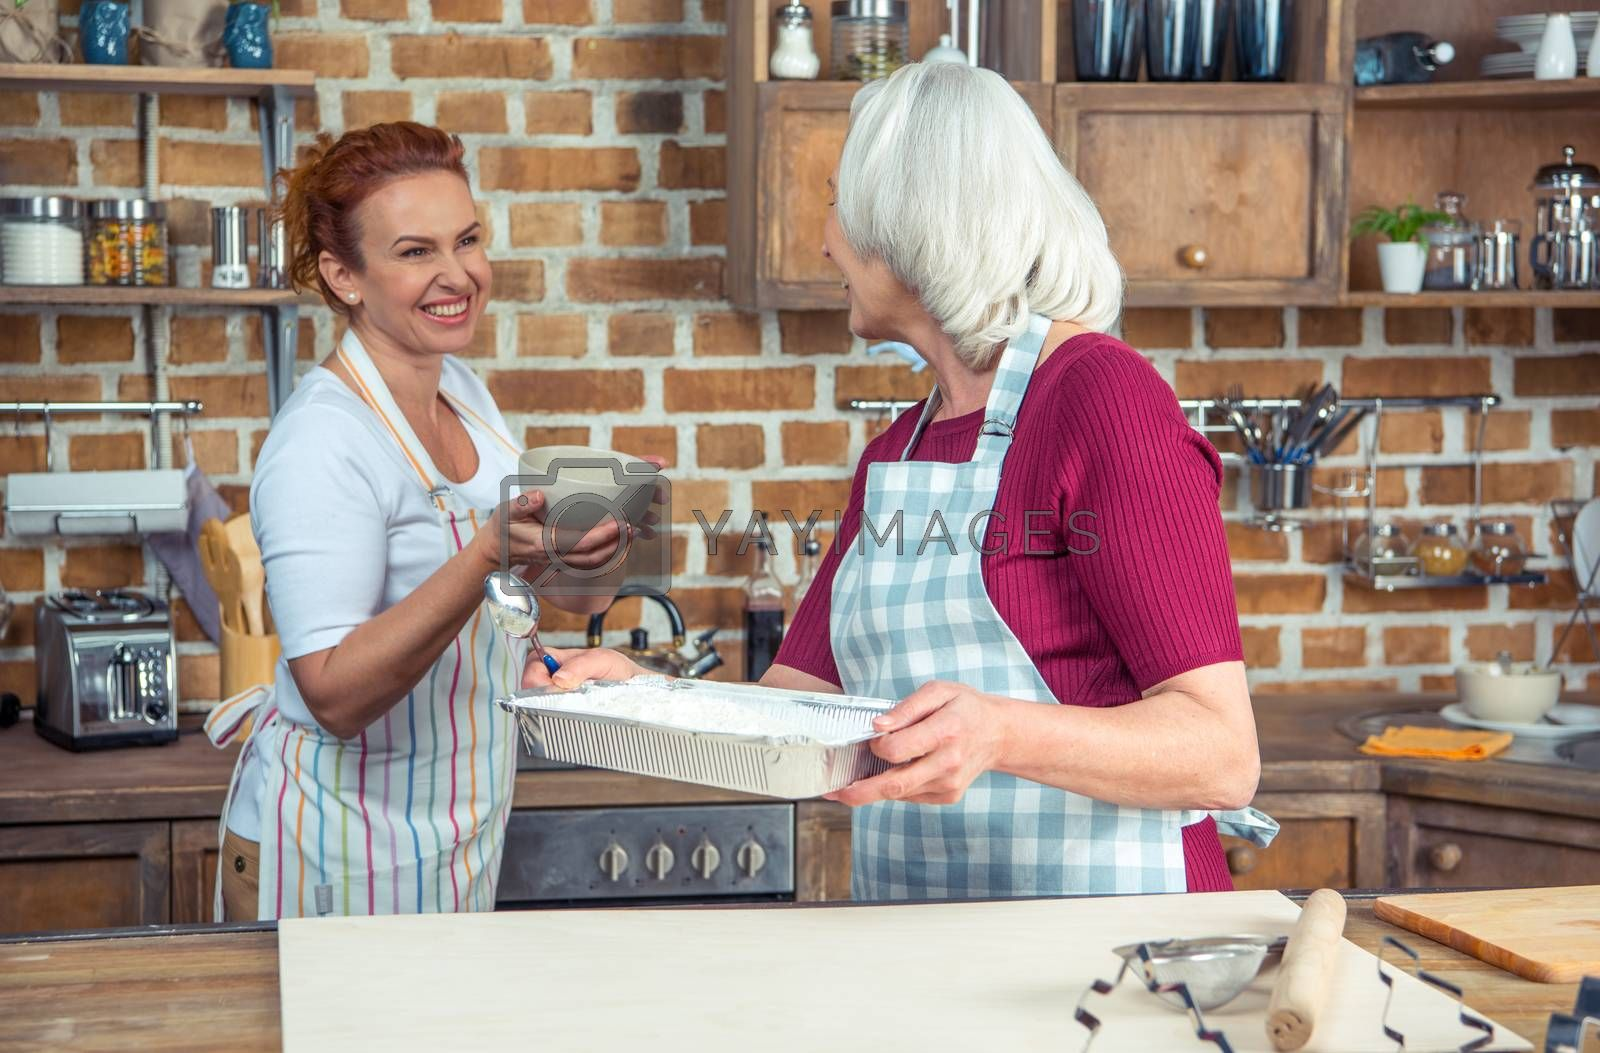 Two women preparing ingredients for baking in kitchen